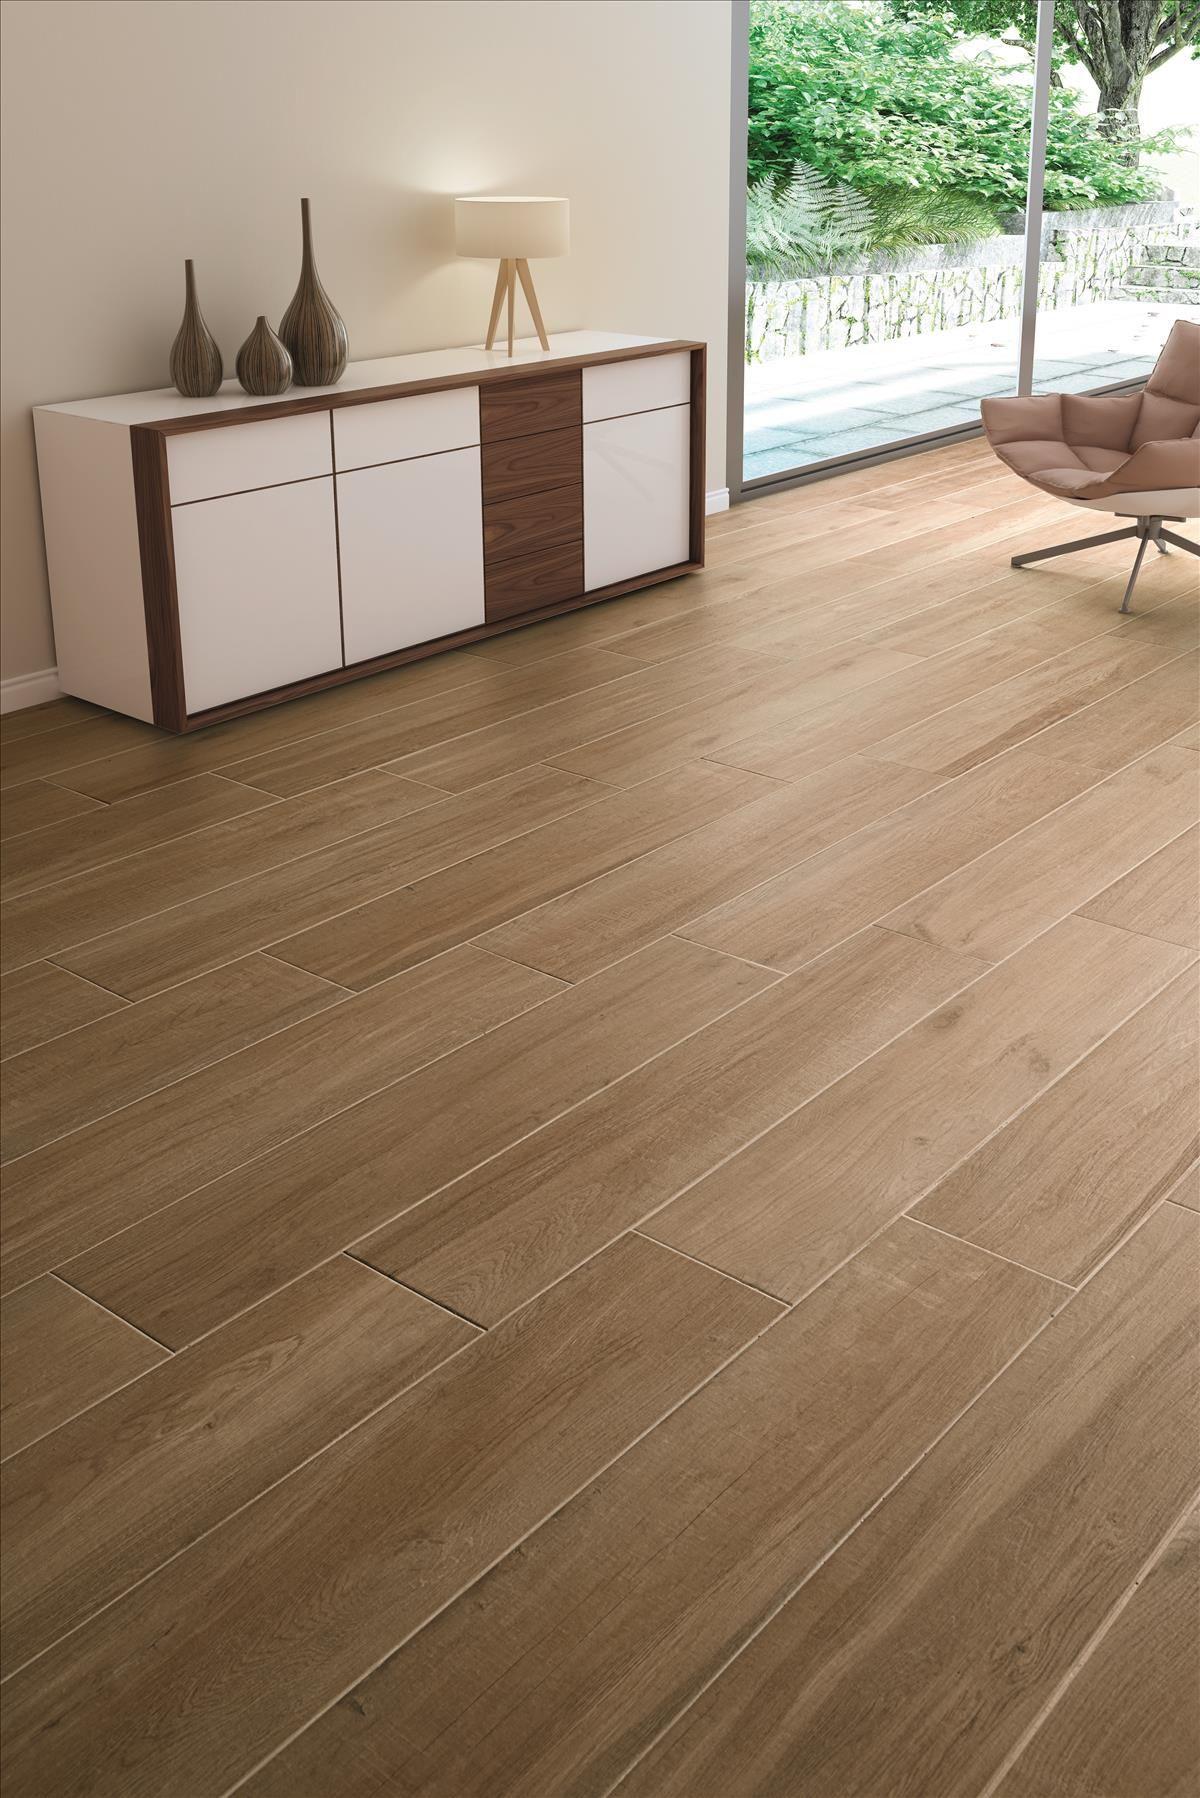 mohawk floorcare essentials hardwood laminate floor cleaner of pavimento imitacia³n madera terk natural 1aa 23x120 amazing with regard to pavimento imitacia³n madera terk natural 1aa 23x120